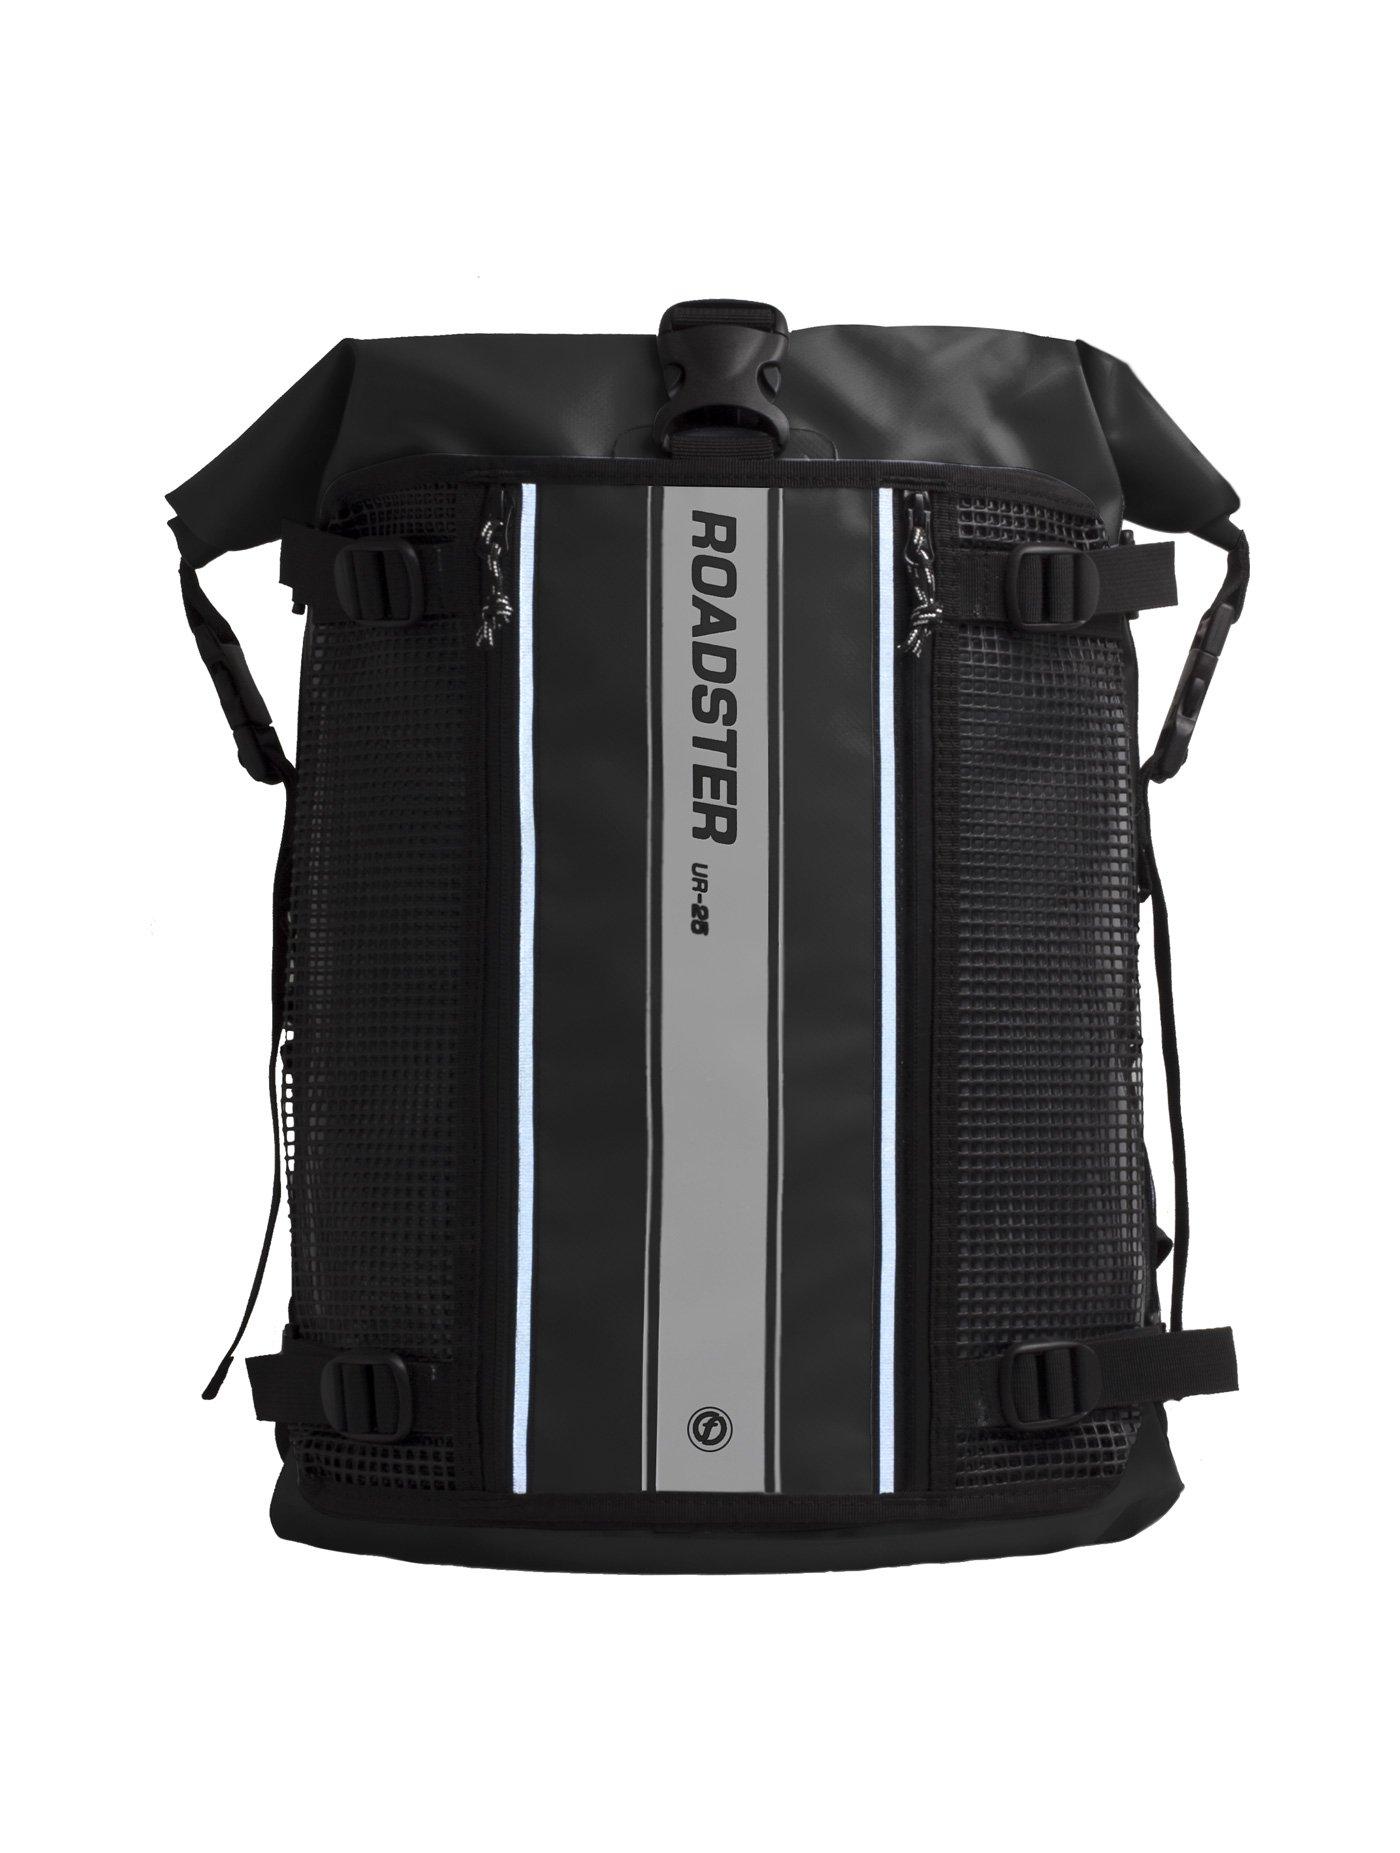 FEELFREE Multipurpose Waterproof Backpack 25 Litres Roadster UR 25, Black Color 1 pcs.